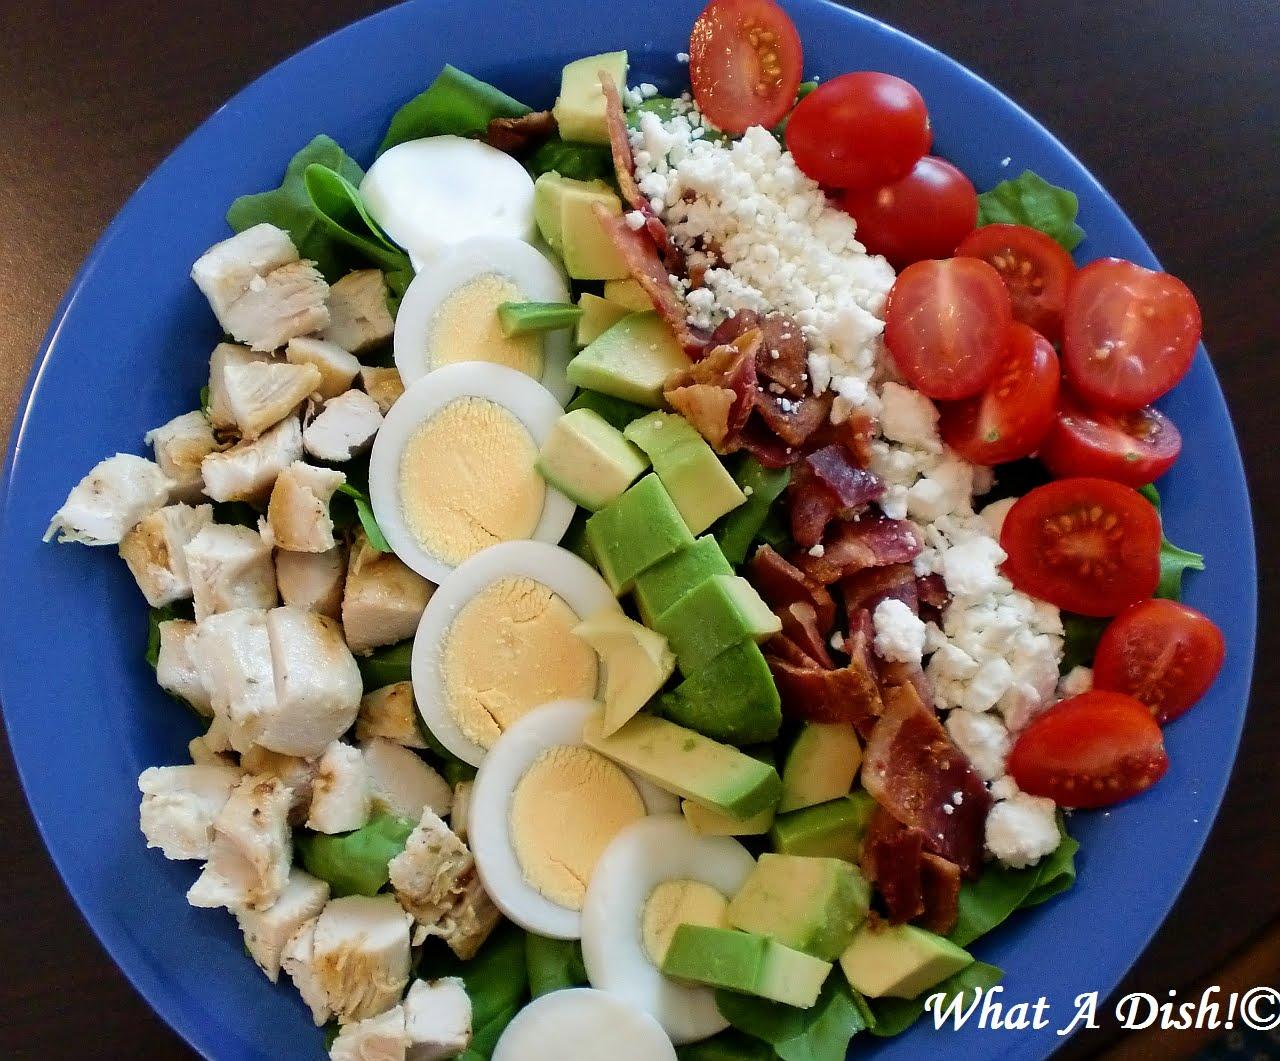 What A Dish!: Cobb Salad